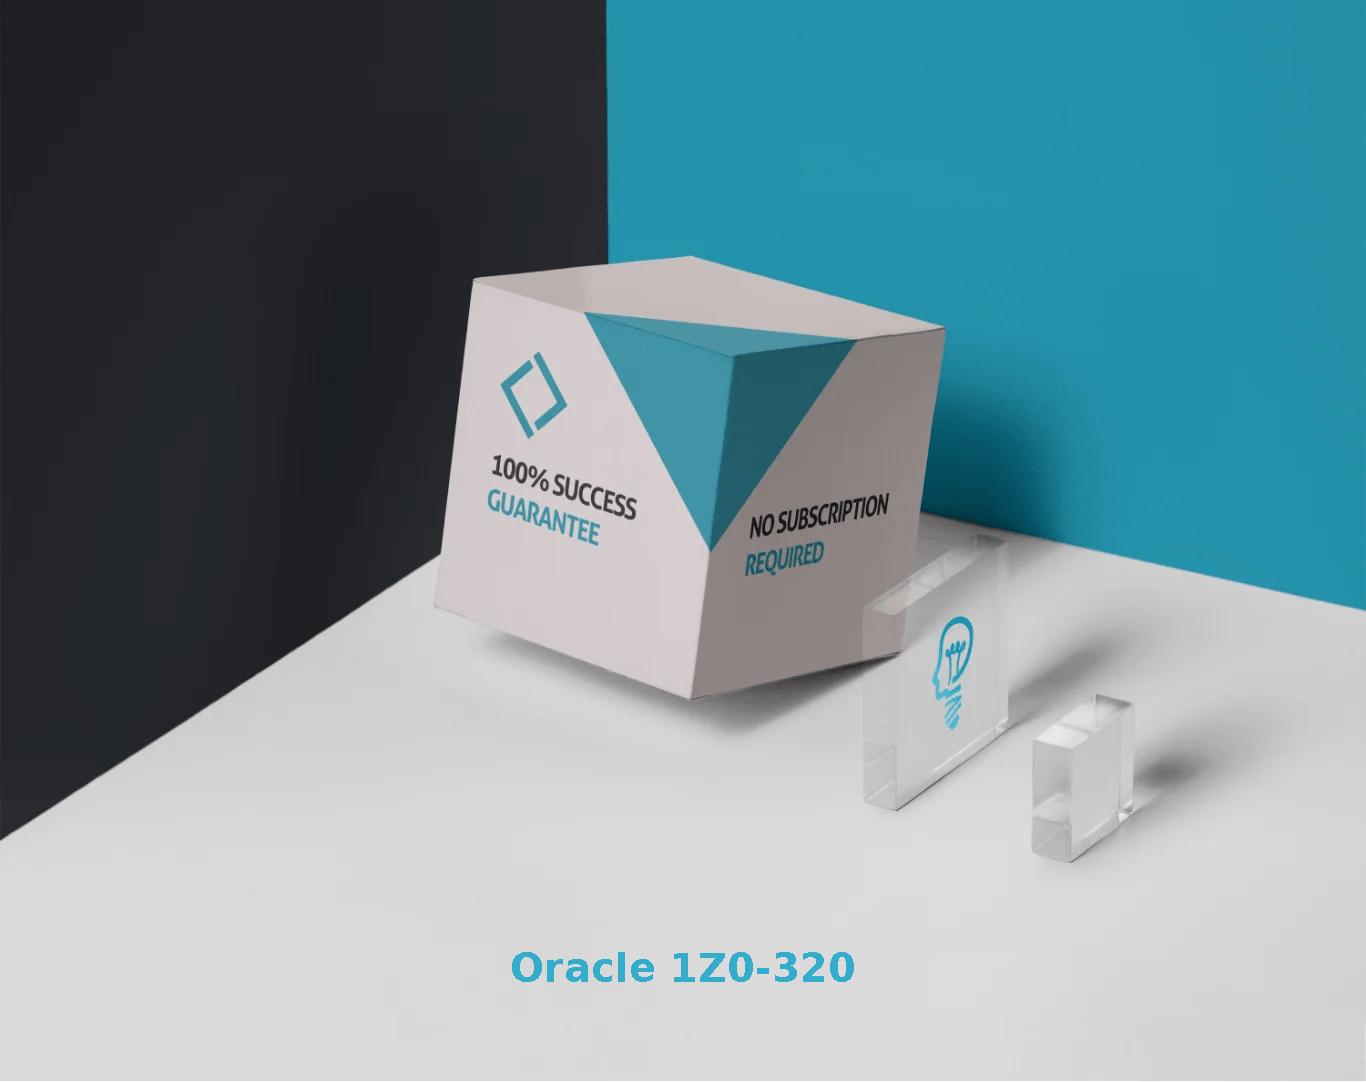 Oracle 1Z0-320 Exams